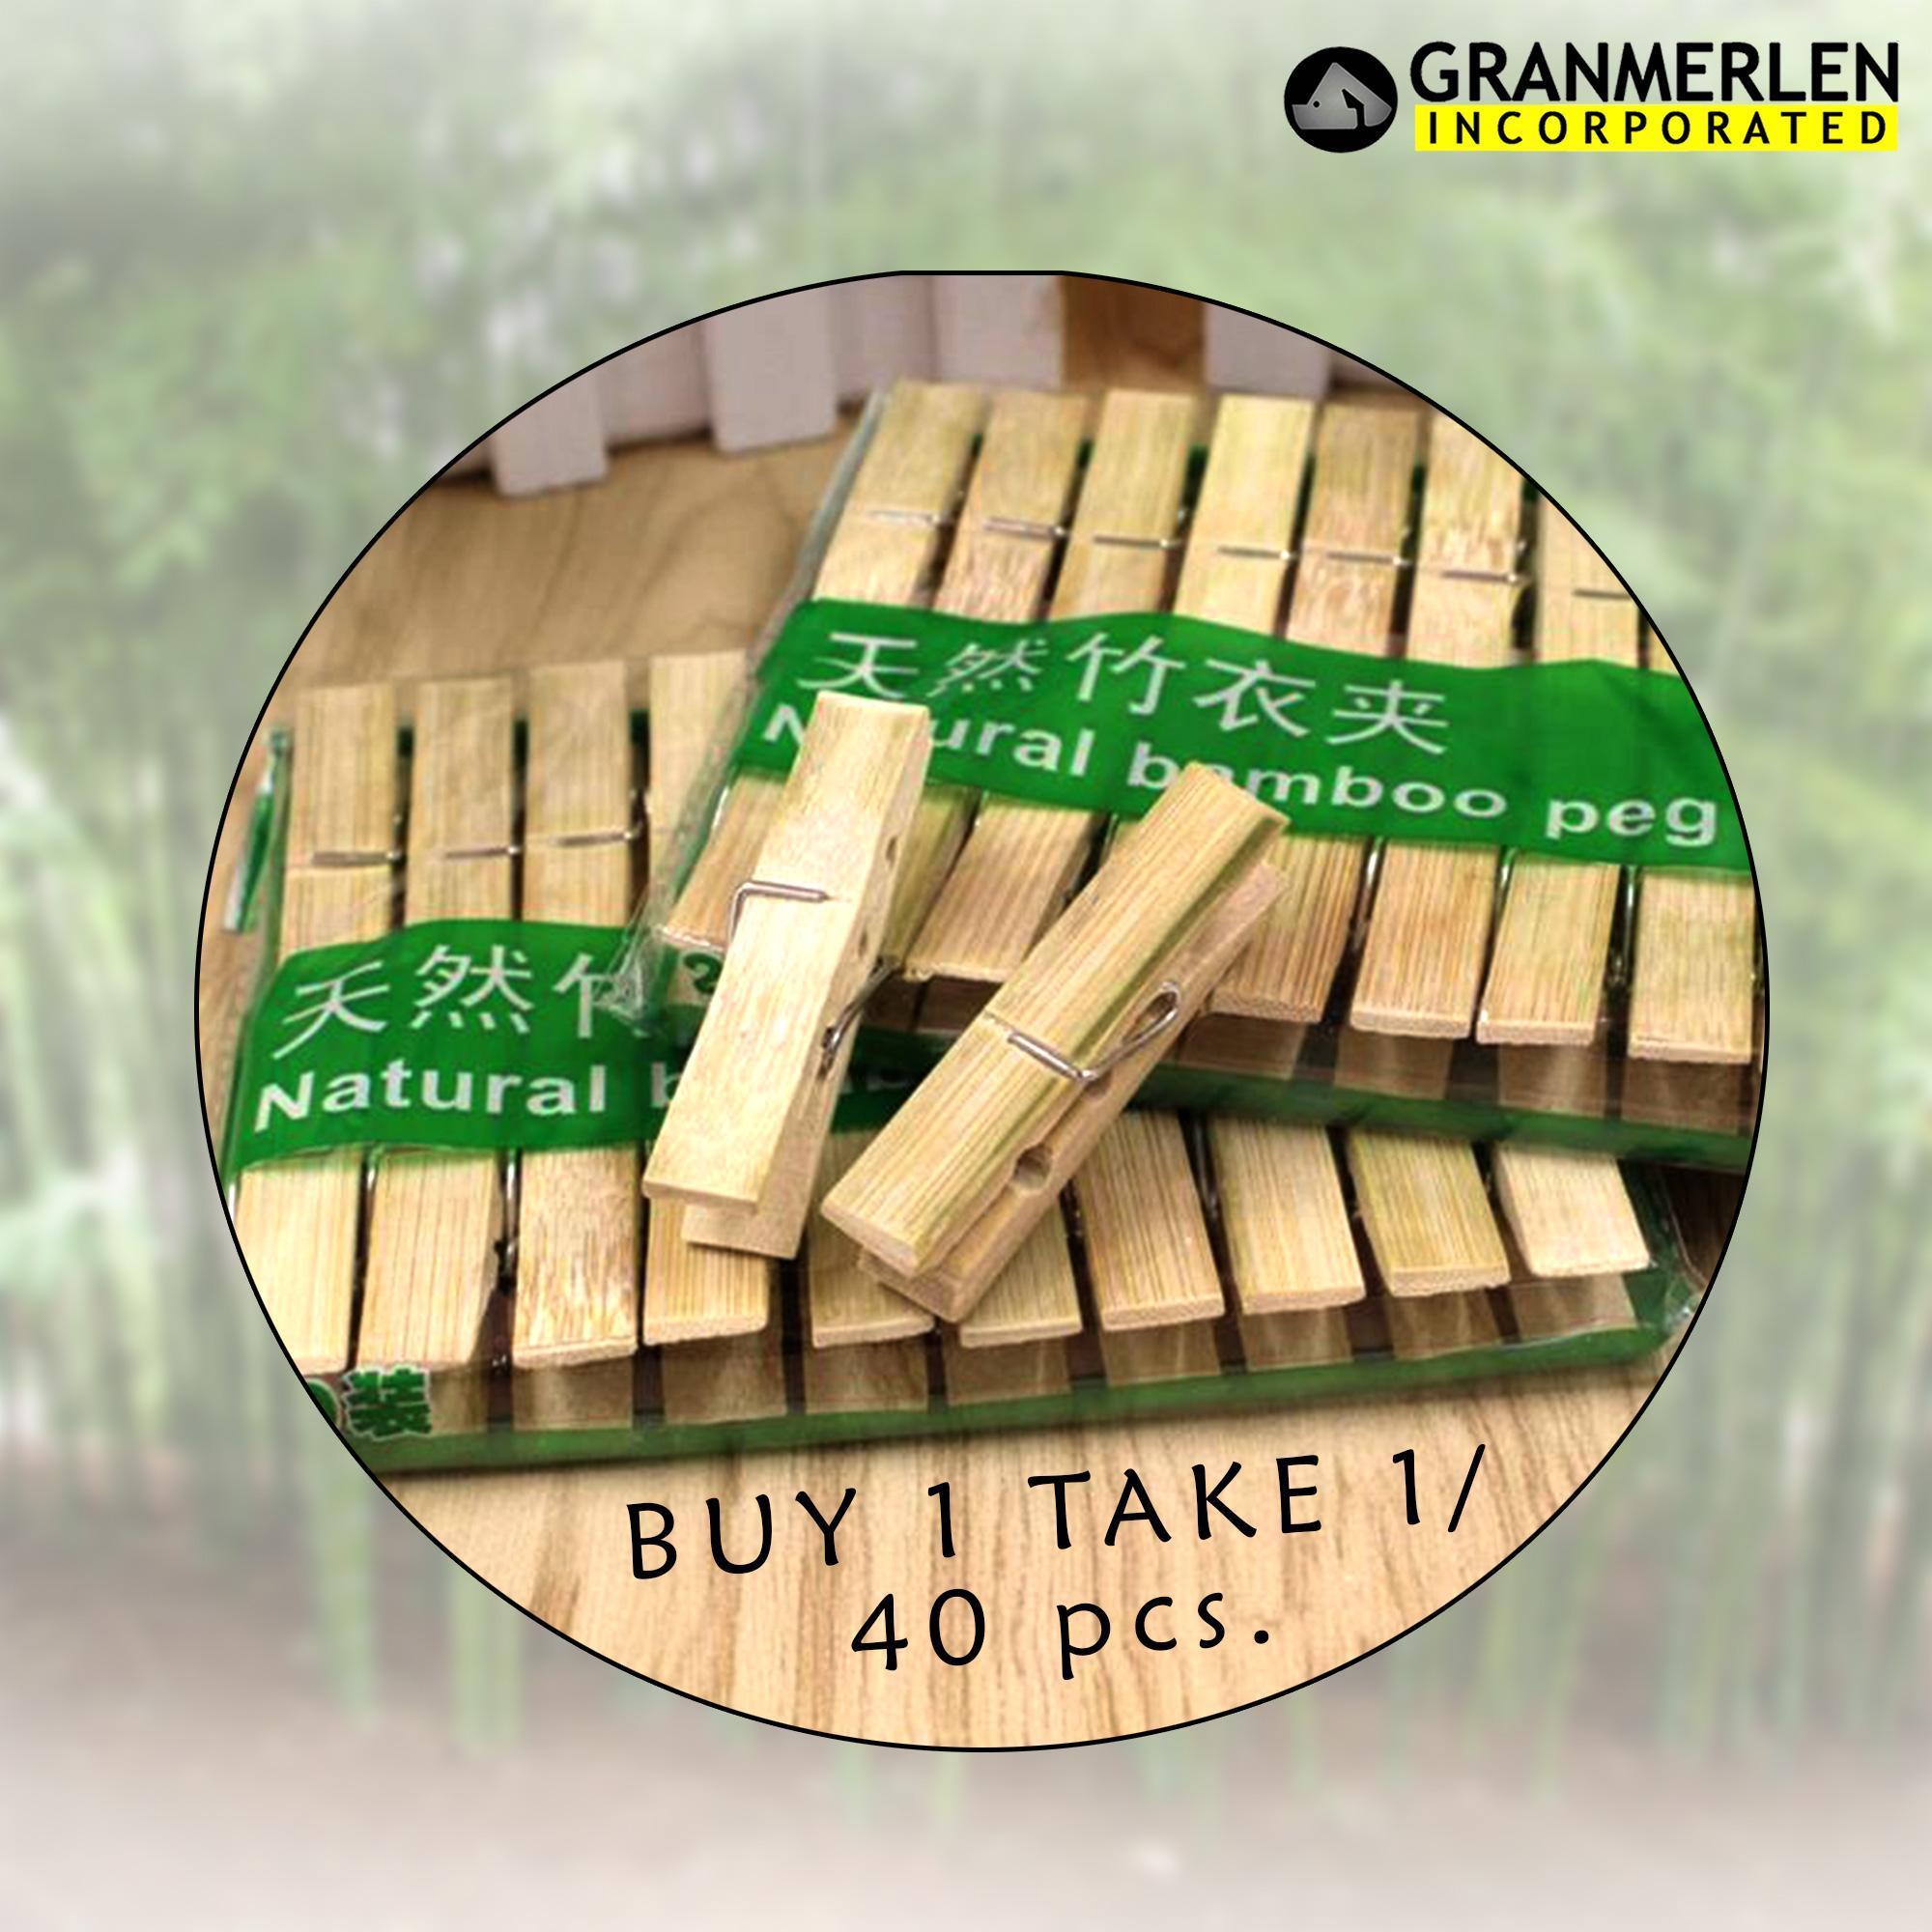 Clothespin Natural Bamboo Peg Airing Clip For Drying Clothes 40 Pcs 2 Pack